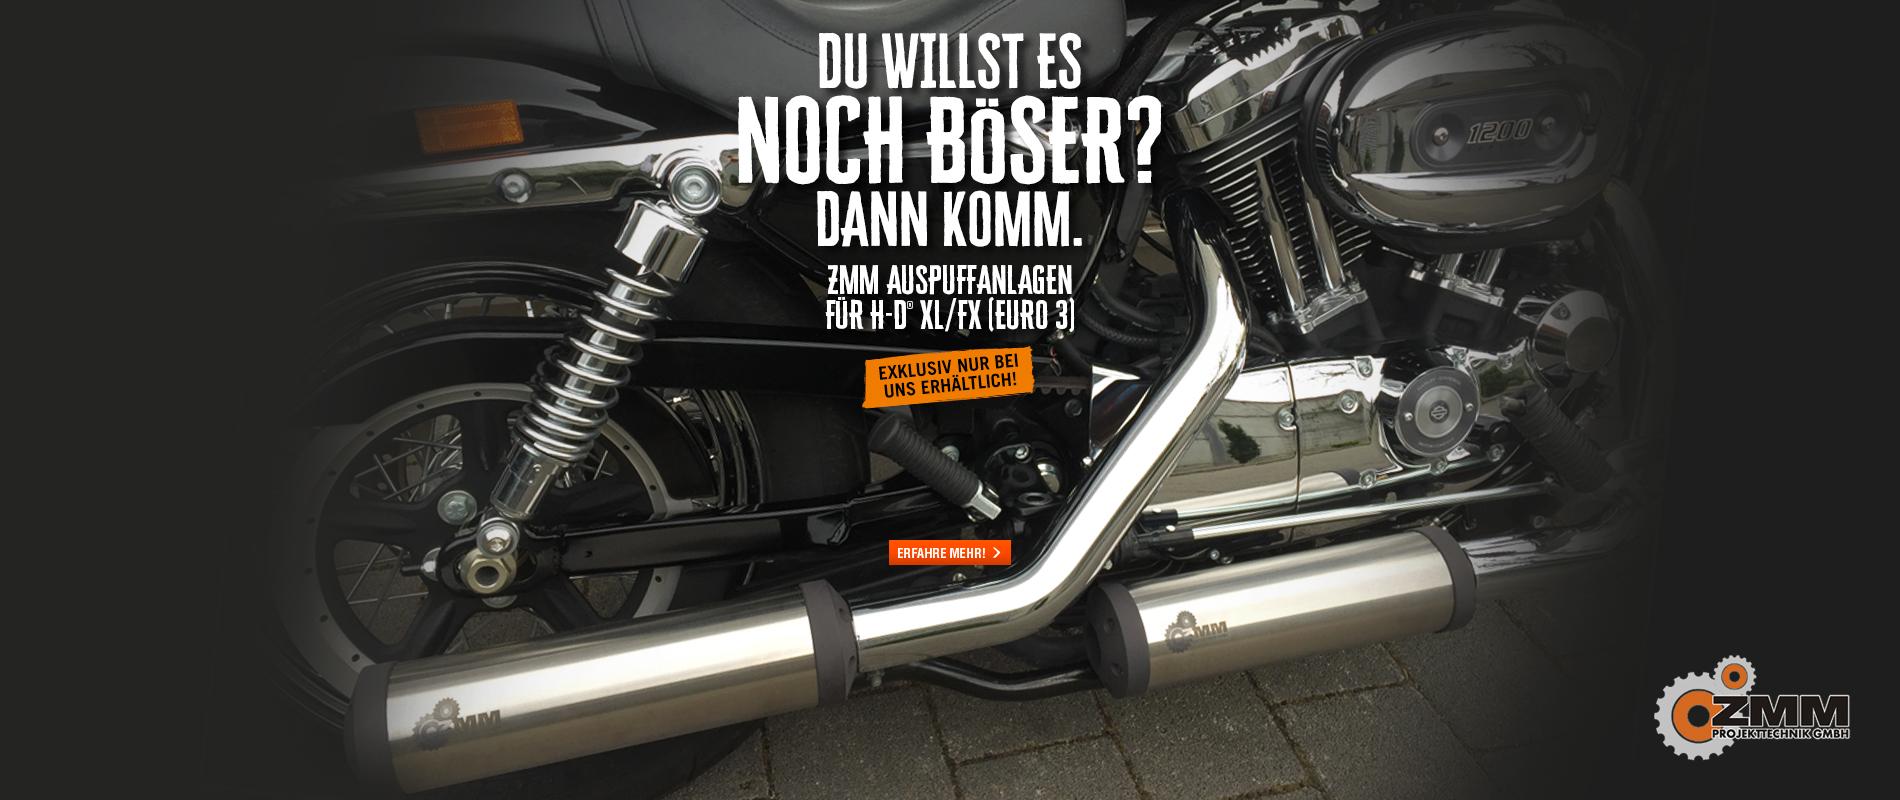 HD_Regensburg_Billboard_SliponAuspuff